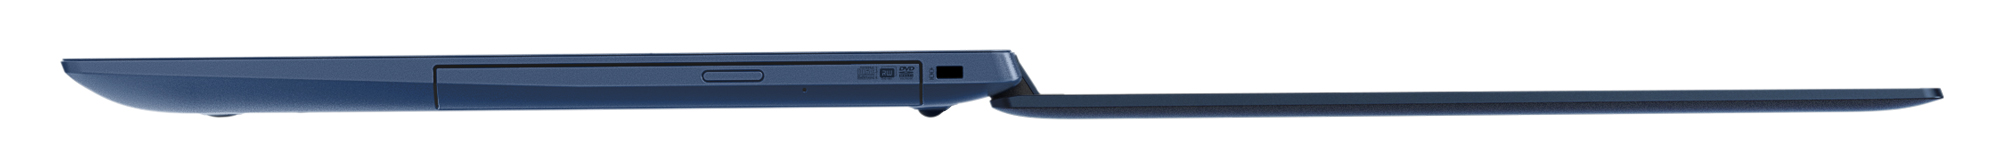 Фото  Ноутбук Lenovo ideapad 330-15IGM Midnight Blue  (81D100Q6RA)